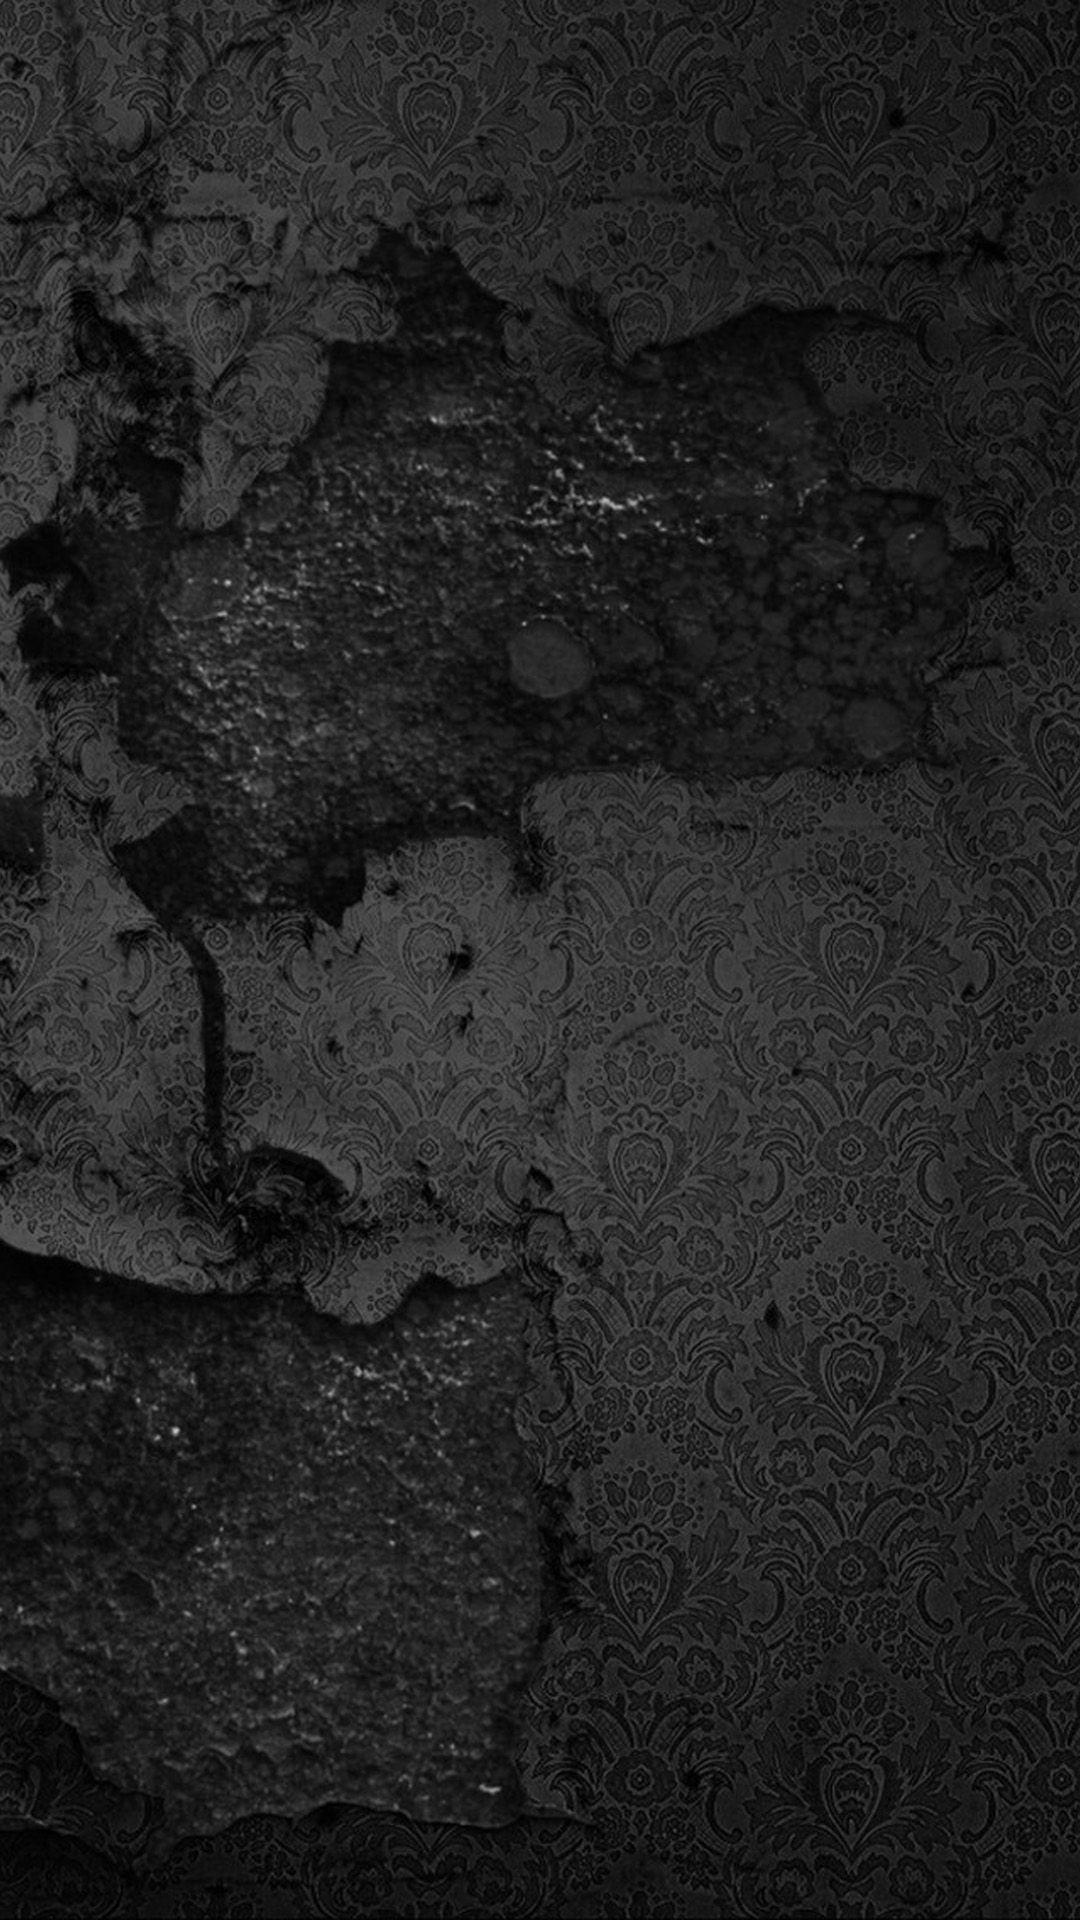 Black Iphone 6 Plus Wallpapers Top Free Black Iphone 6 Plus Backgrounds Wallpaper Black Wallpaper Iphone Iphone 6 Plus Wallpaper Black Wallpaper For Mobile